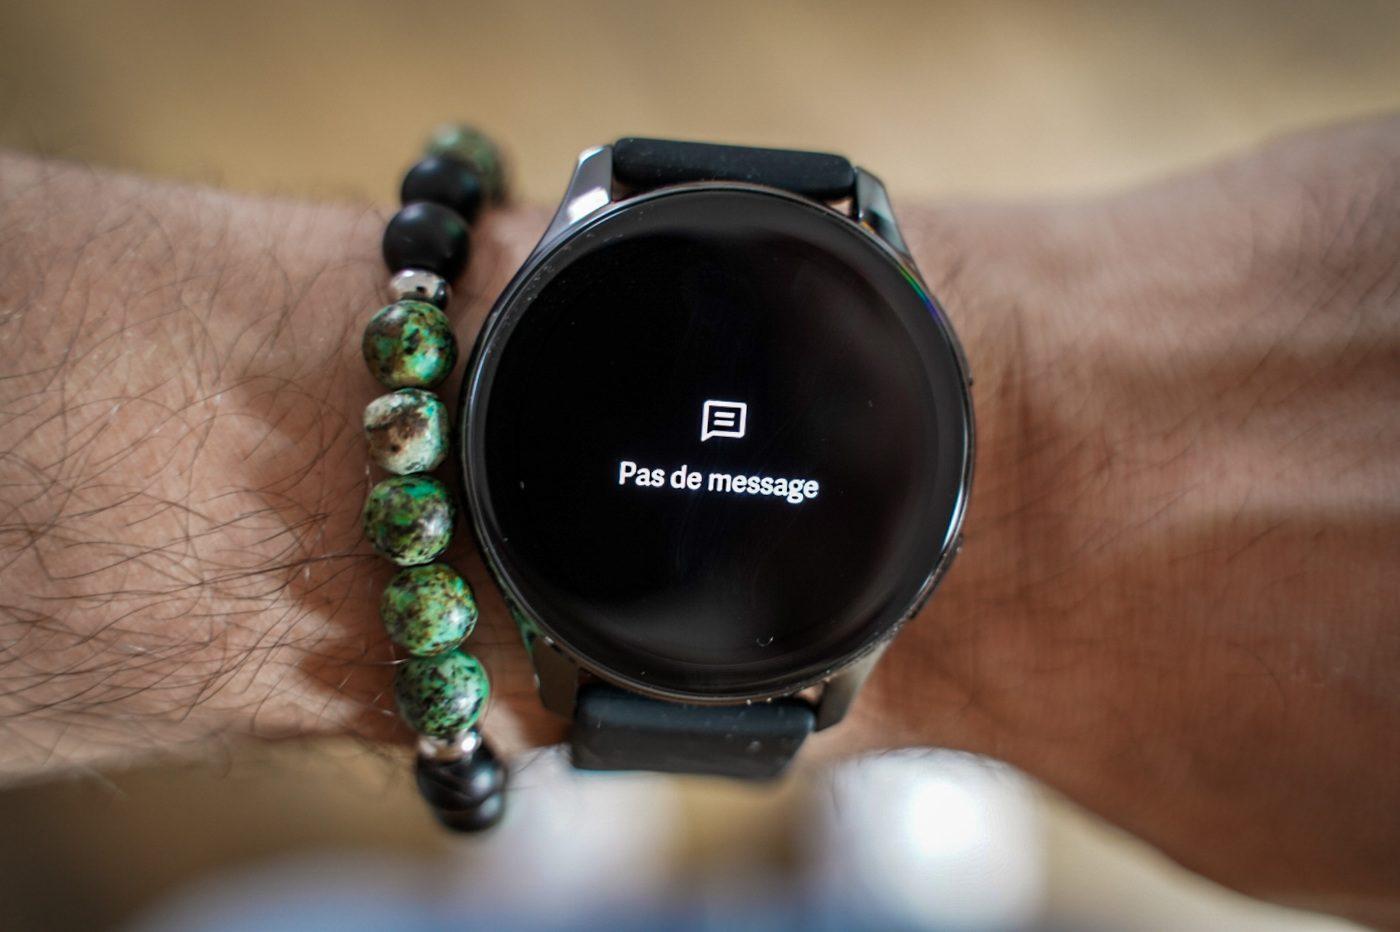 test oneplus watch notifications